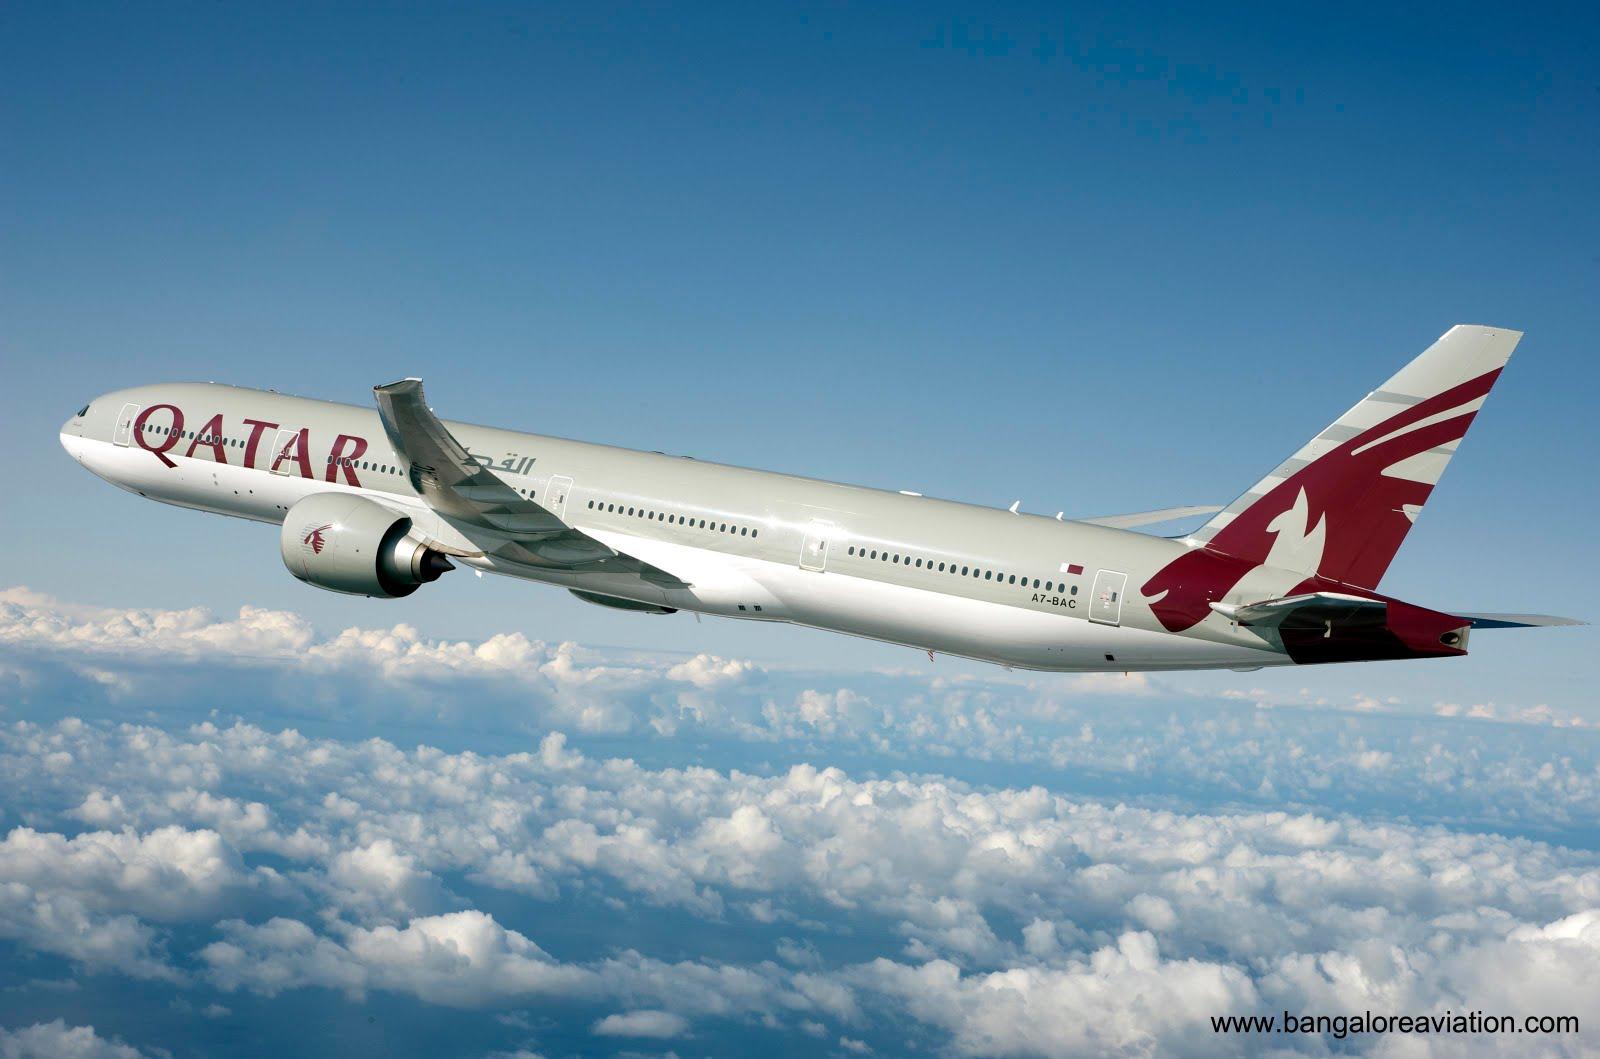 Qatar Airways economy class review - The Luxury in Economy